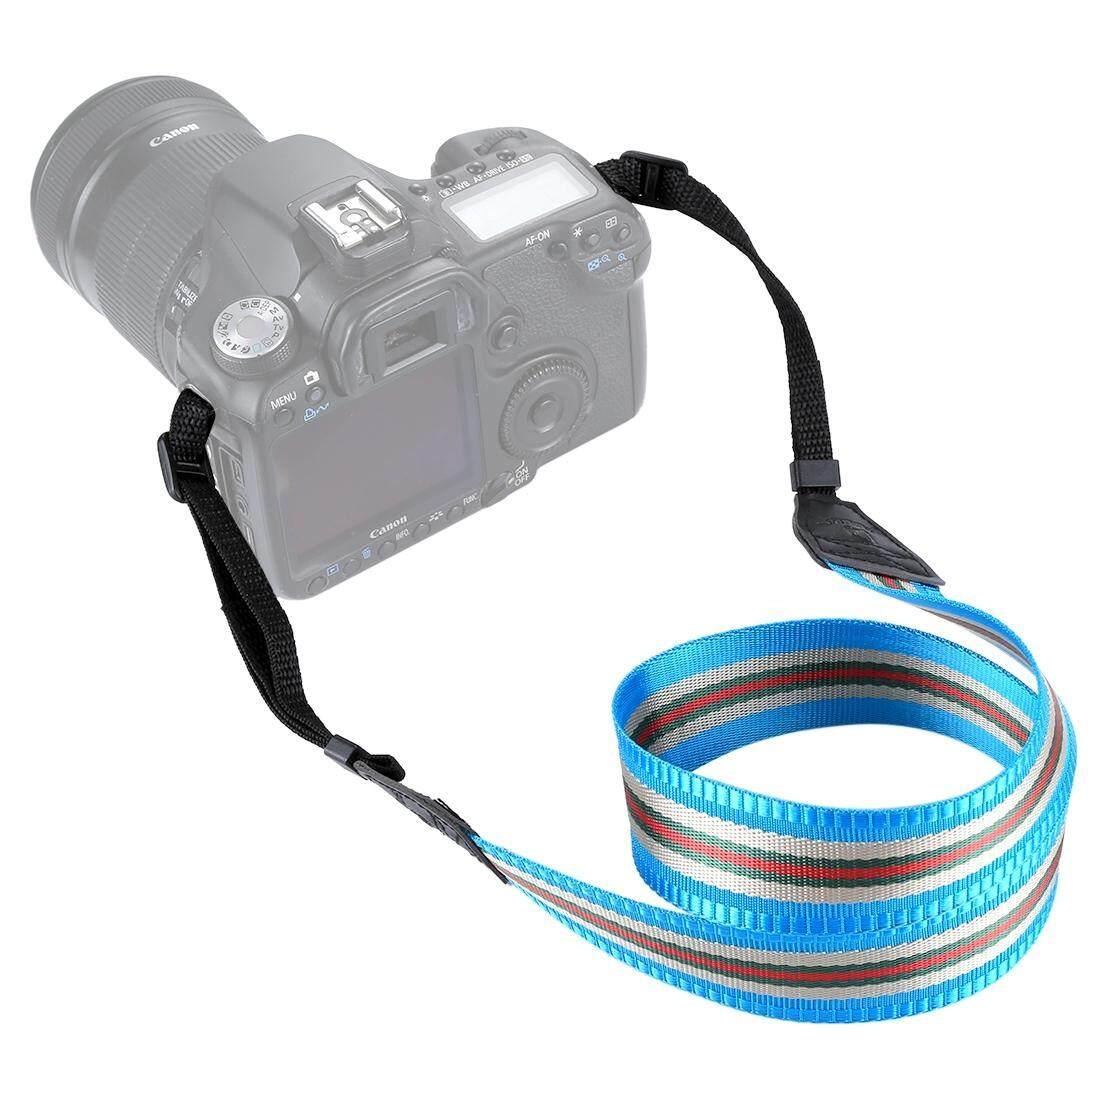 Features Camera Strap Shoulder Bags Wristband For Film Slr Caden Quick Rapid Sling Kamera Puluz Stripe Style Series Neck Dslr Cameras